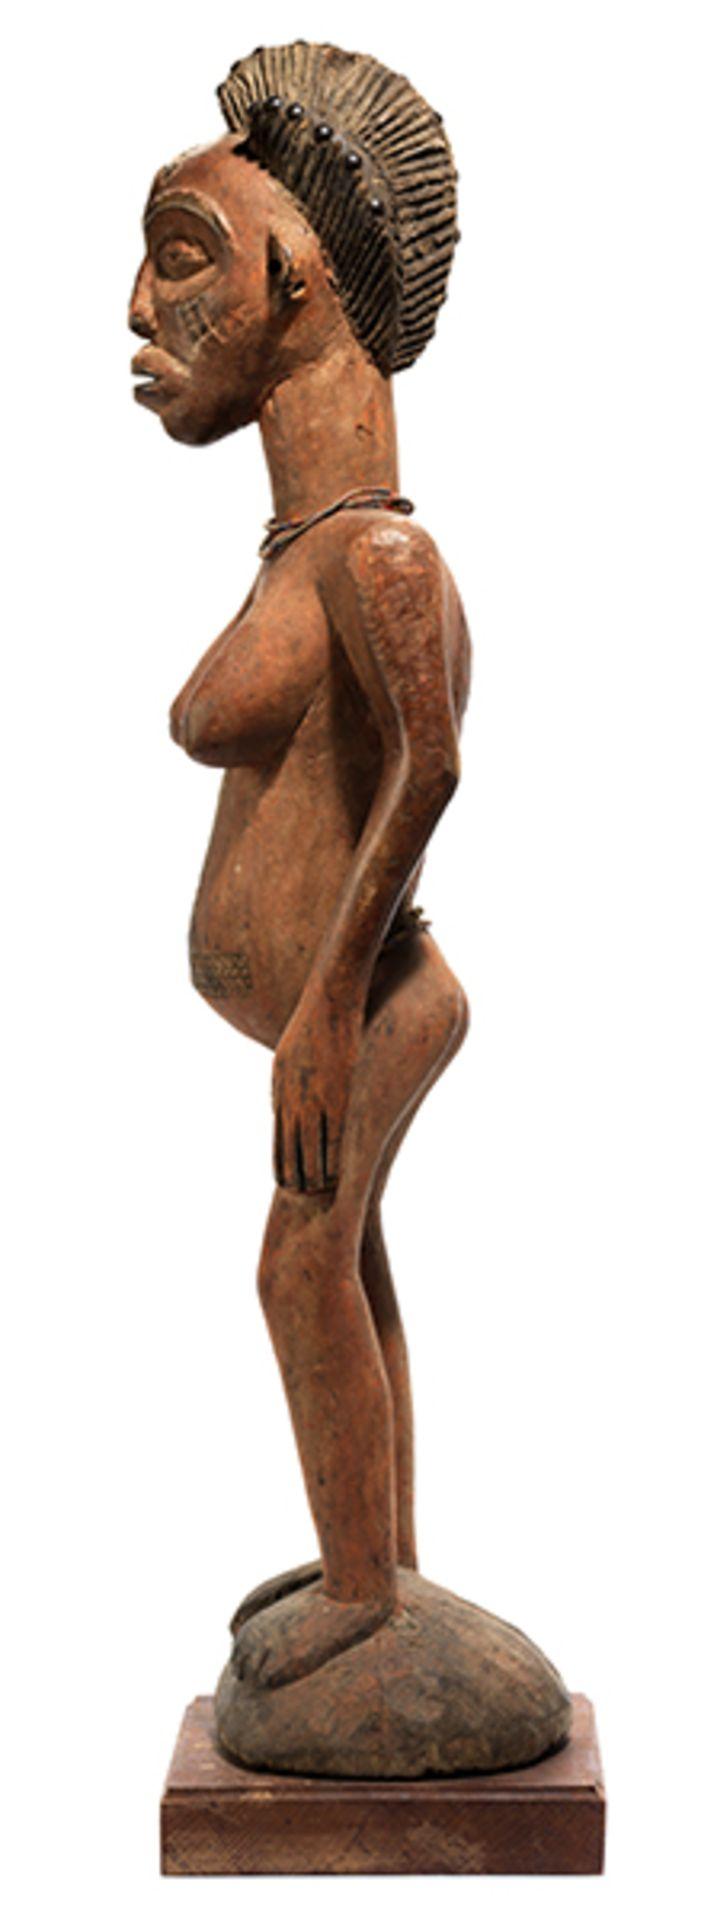 Los 903 - Chowke-Figur Höhe: 91 cm. Höhe mit Sockel: 96 cm. Angola/ Demokratische Republik Kongo....